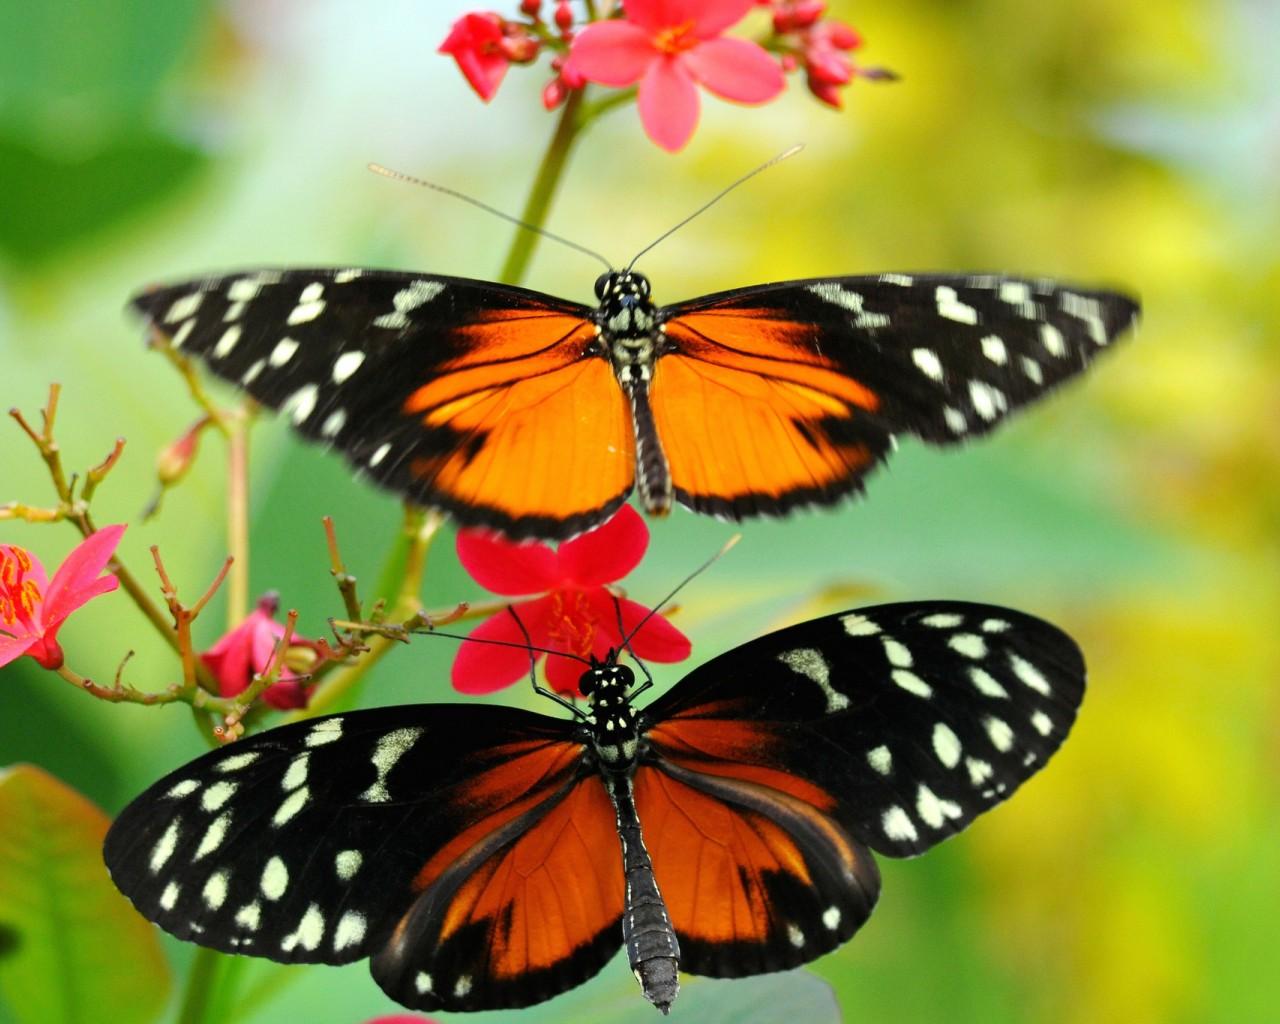 Cantiknya Kupu Kupu di Antara Bunga yang Indah